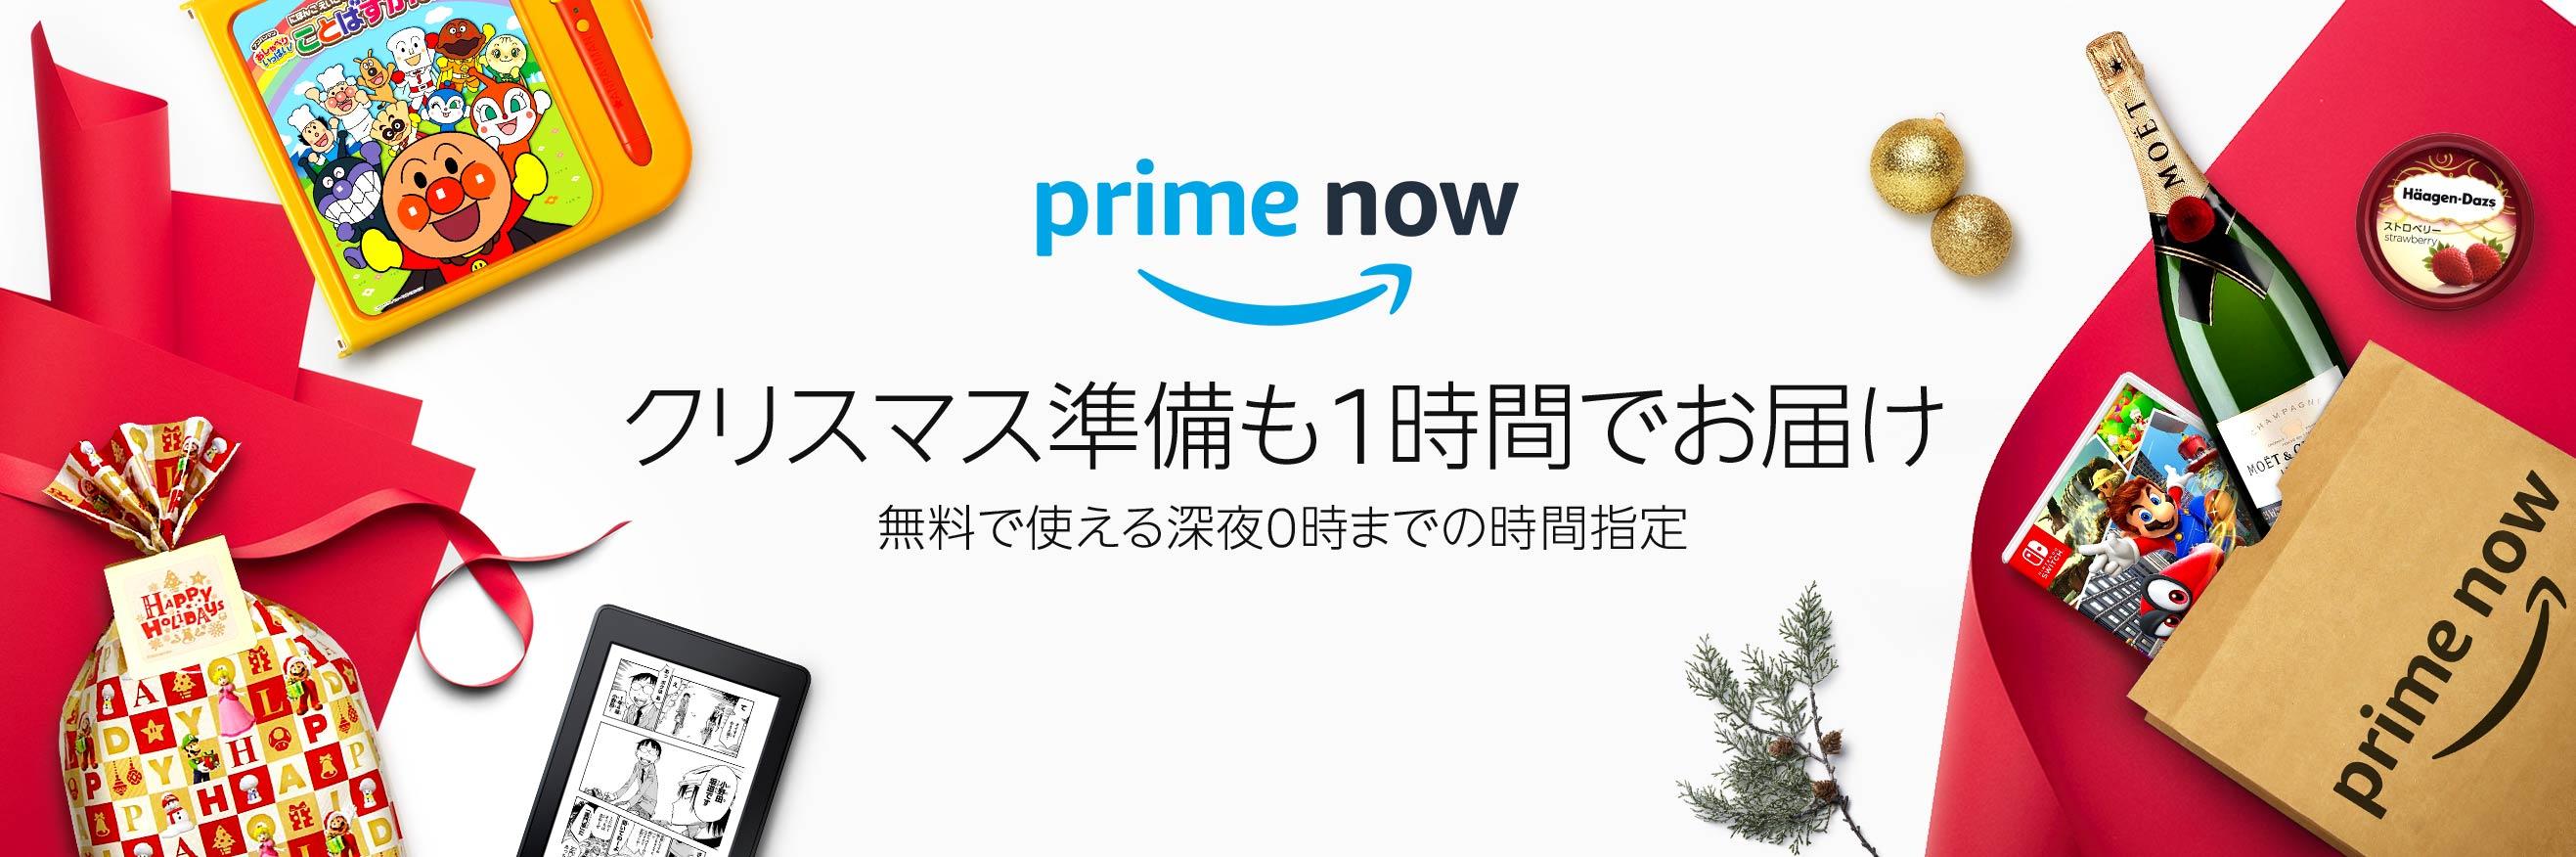 Amazon Prime Now(アマゾンプライム ナウ) -好きな時間が選べる、1時間で届く